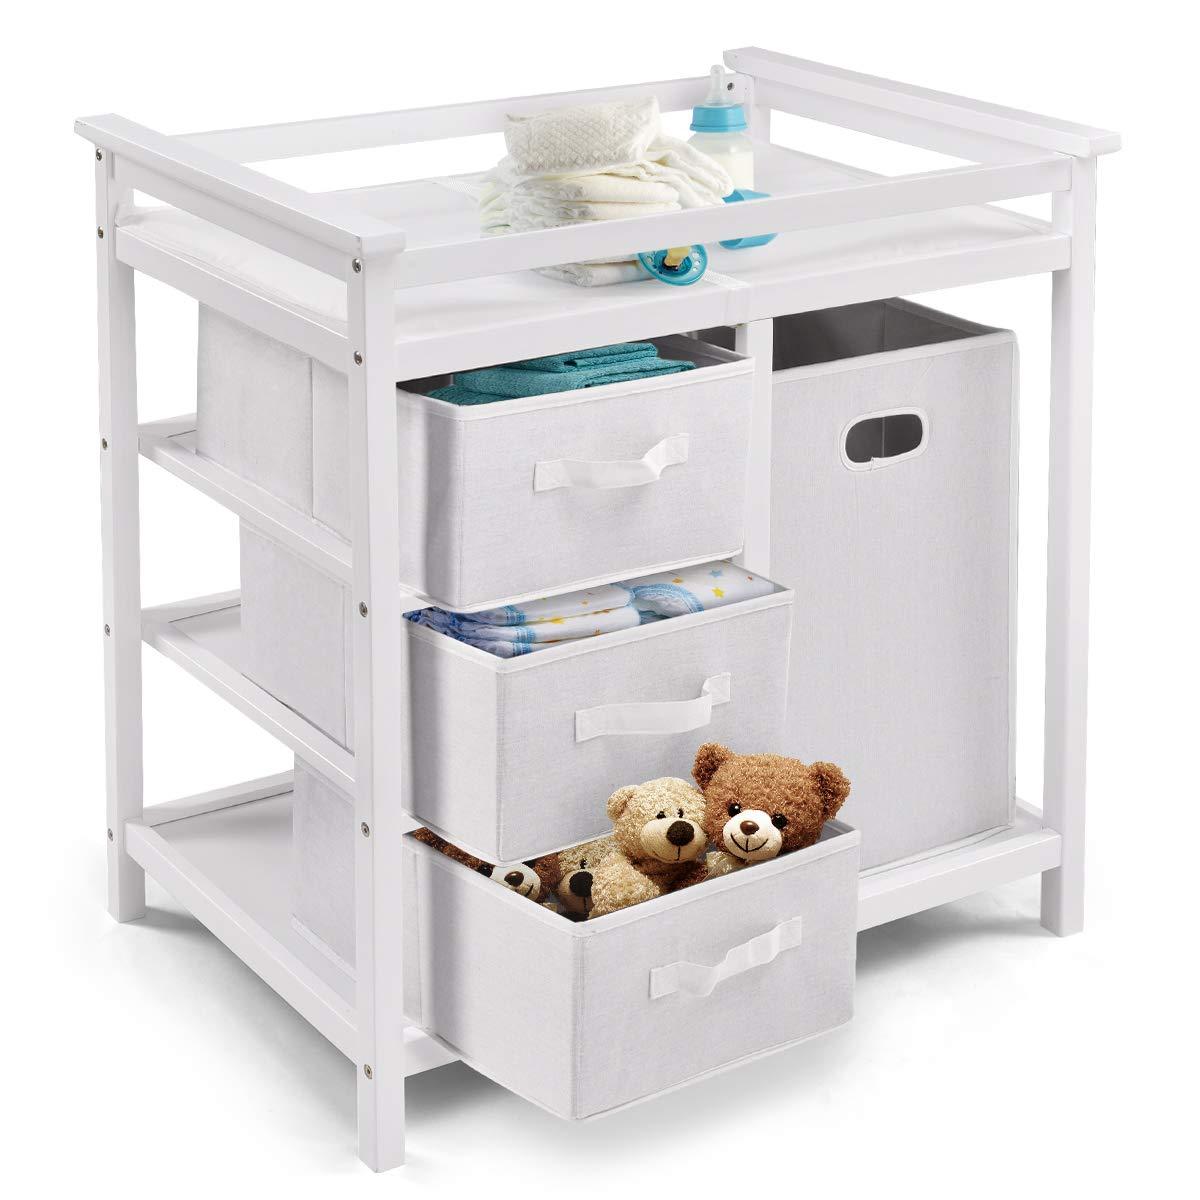 Costzon Baby Changing Table Basket Hamper Infant Diaper Nursery Station White